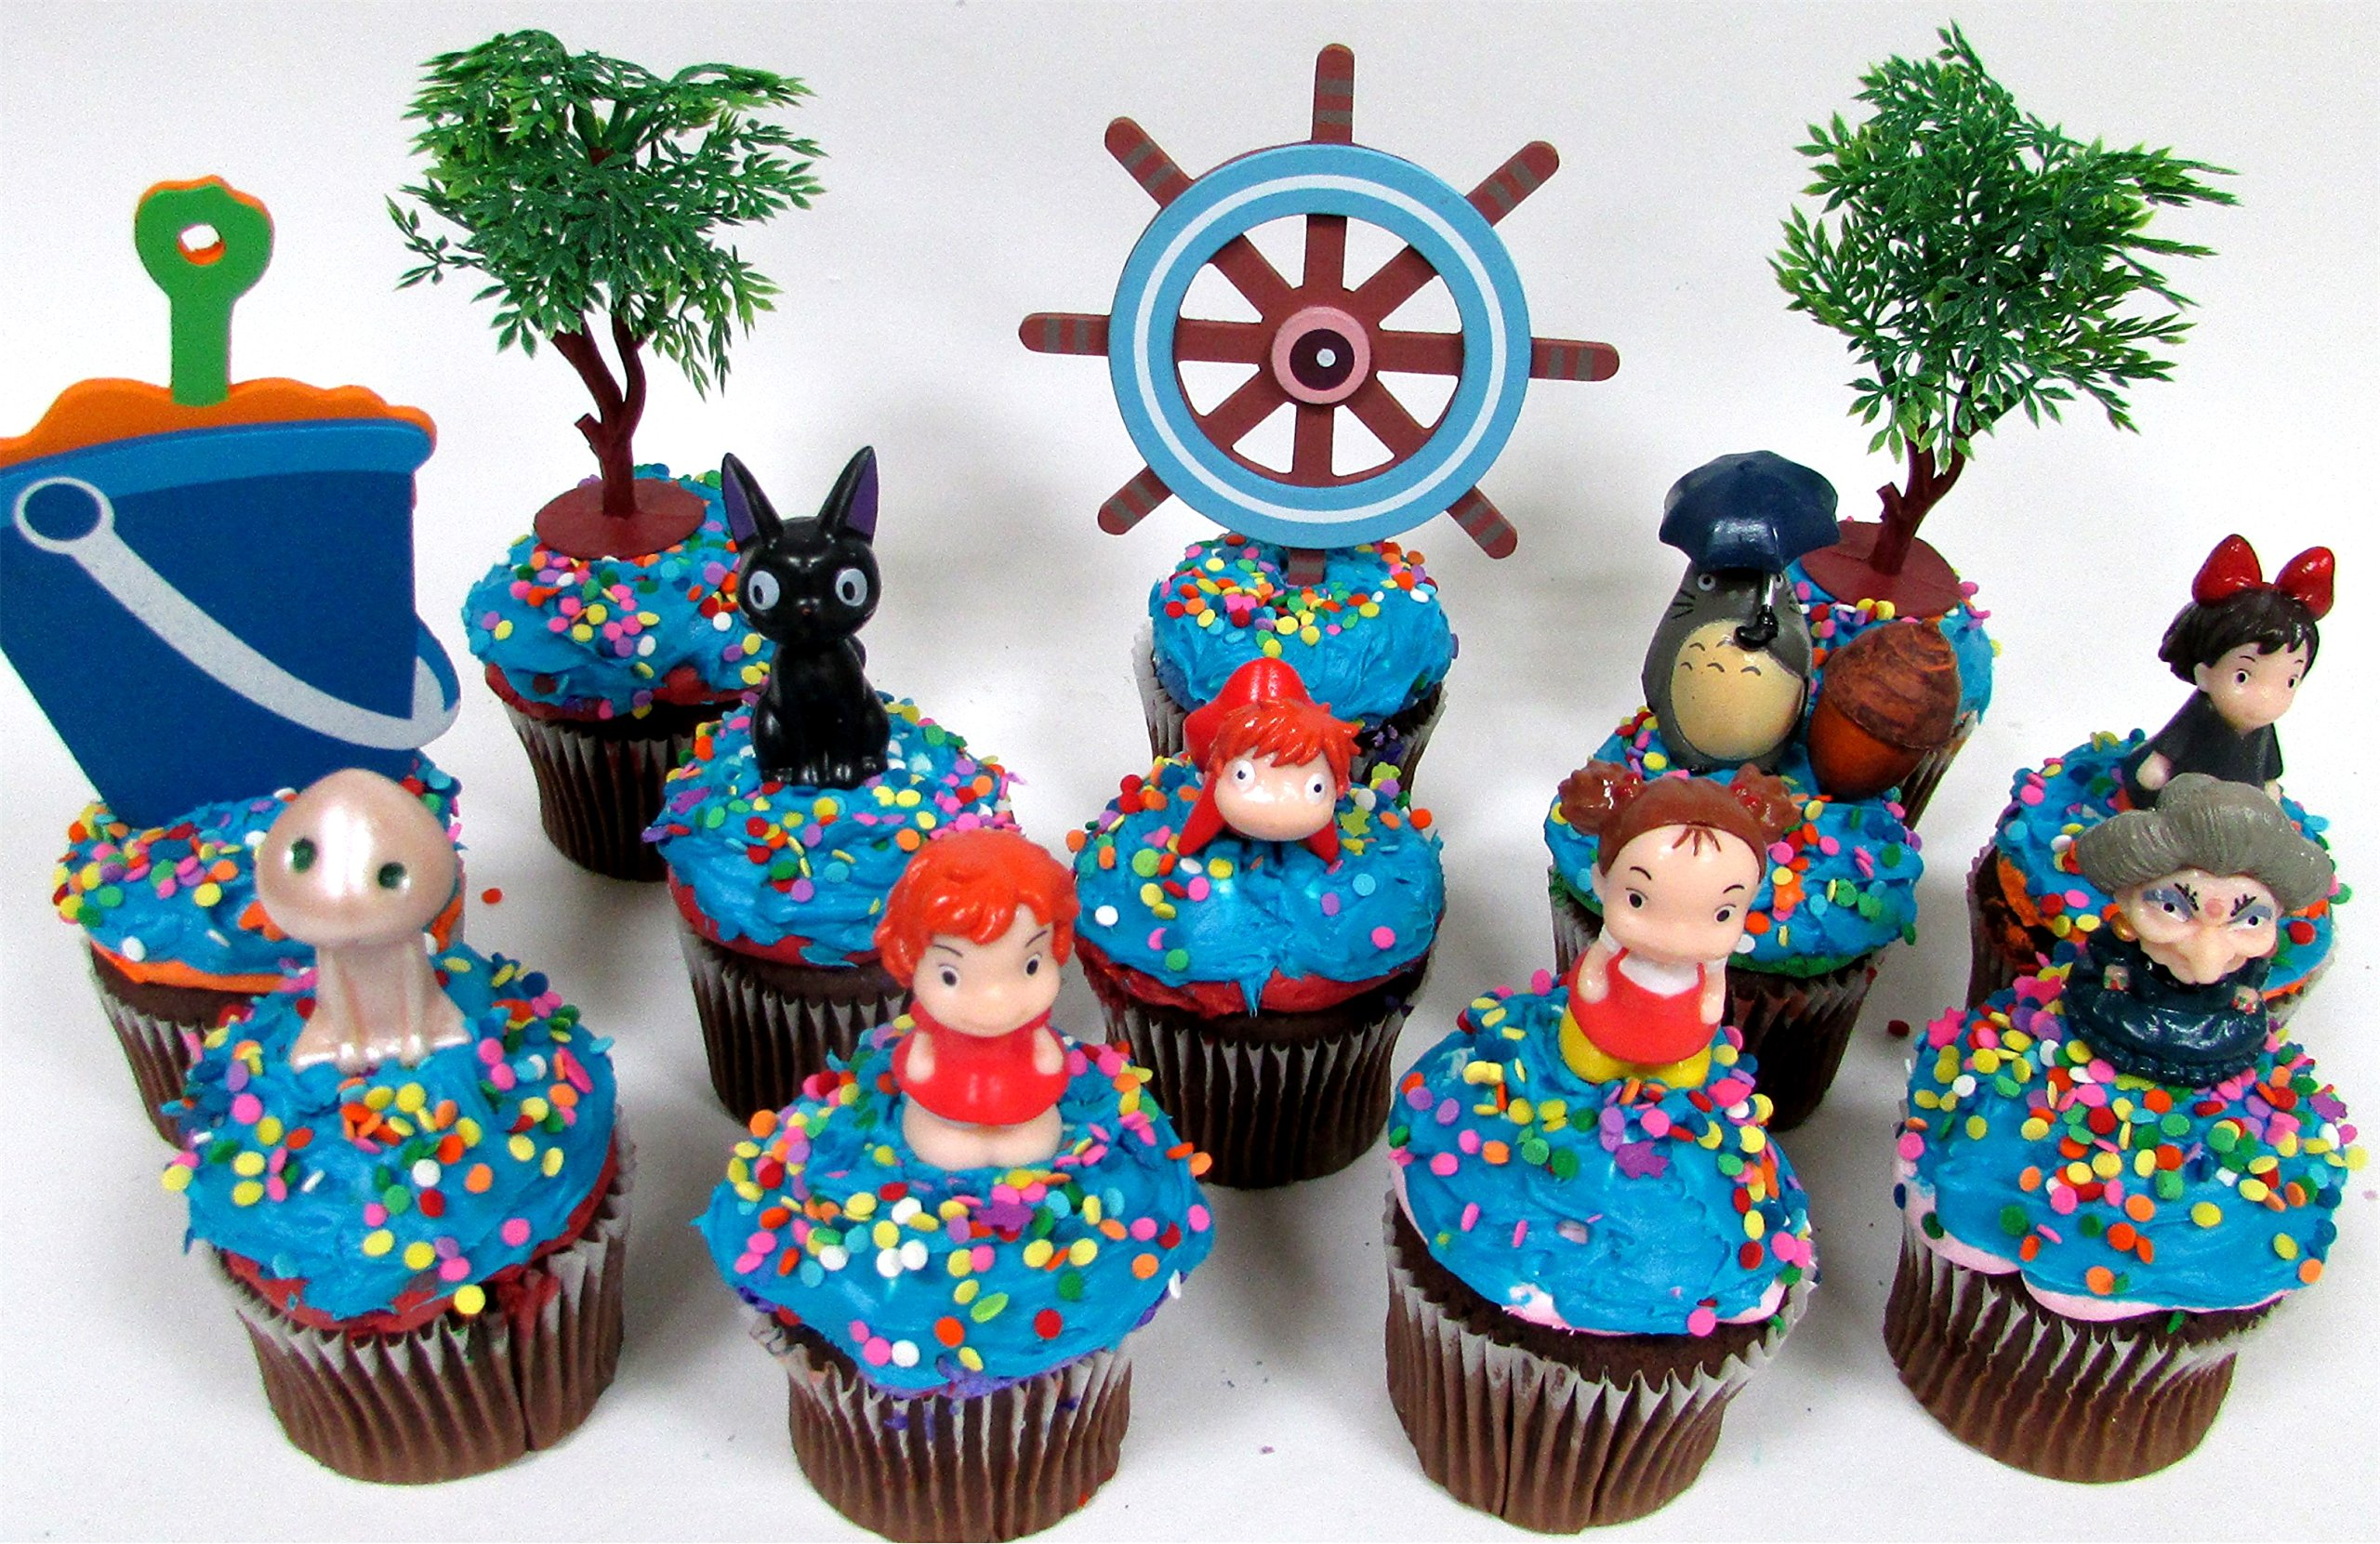 cupcake topper Anime Studio Ghibli Themed Birthday Set Featuring Ponyo, Yubaba, Jiji, Kodoma, Decorative Themed Accessories, Figures Average 1'' to 2'' Tall